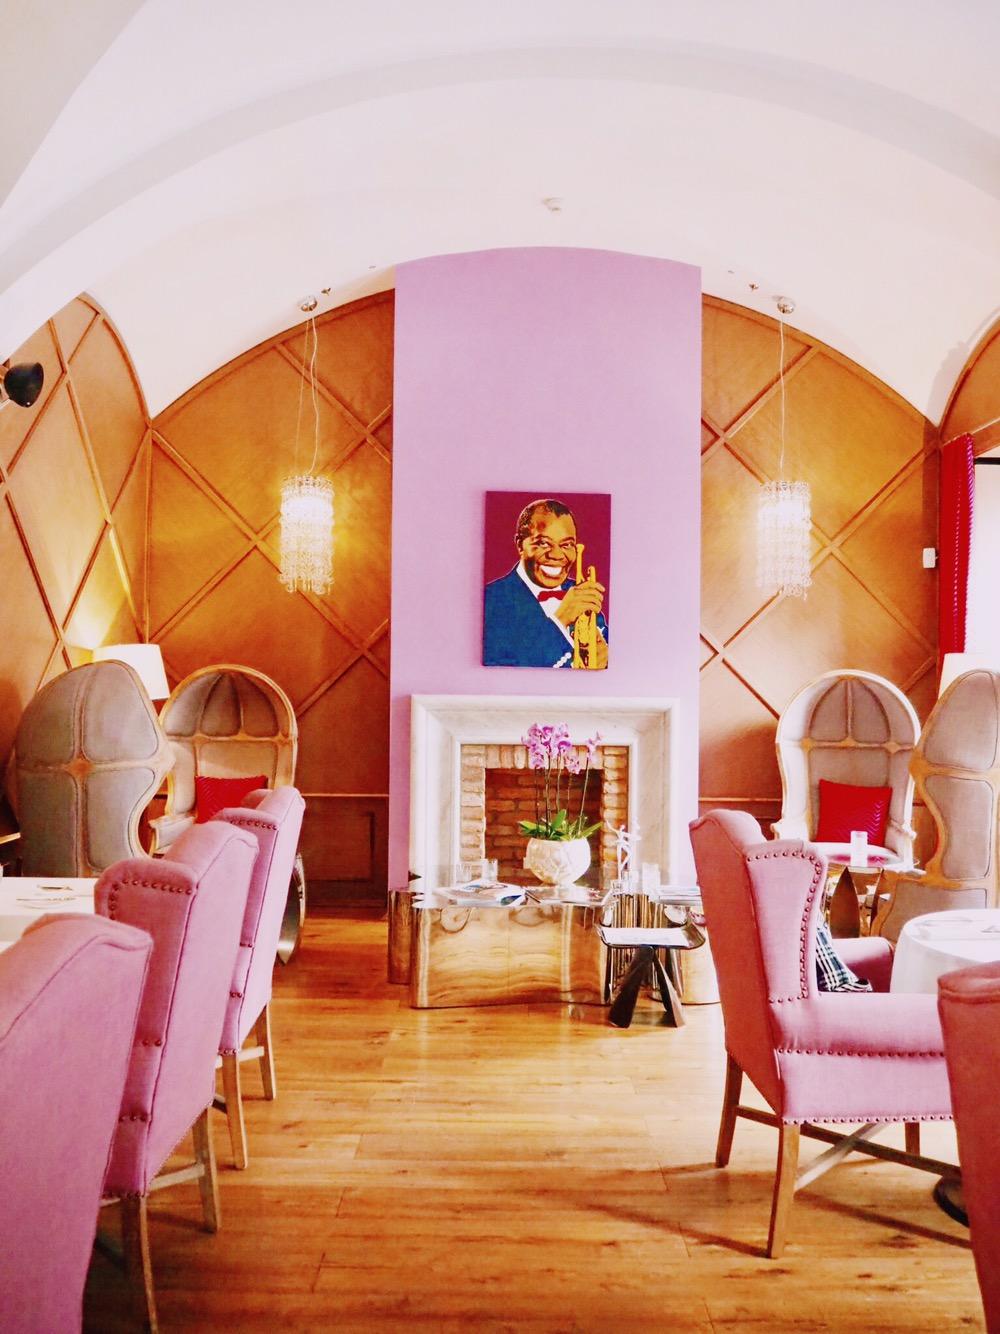 21560762 73ab 46d0 ab0f 5ce017a25874 - Aria Hotel Budapest - 音楽に囲まれて過ごすブダペストのラグジュアリーブティックホテルの魅力